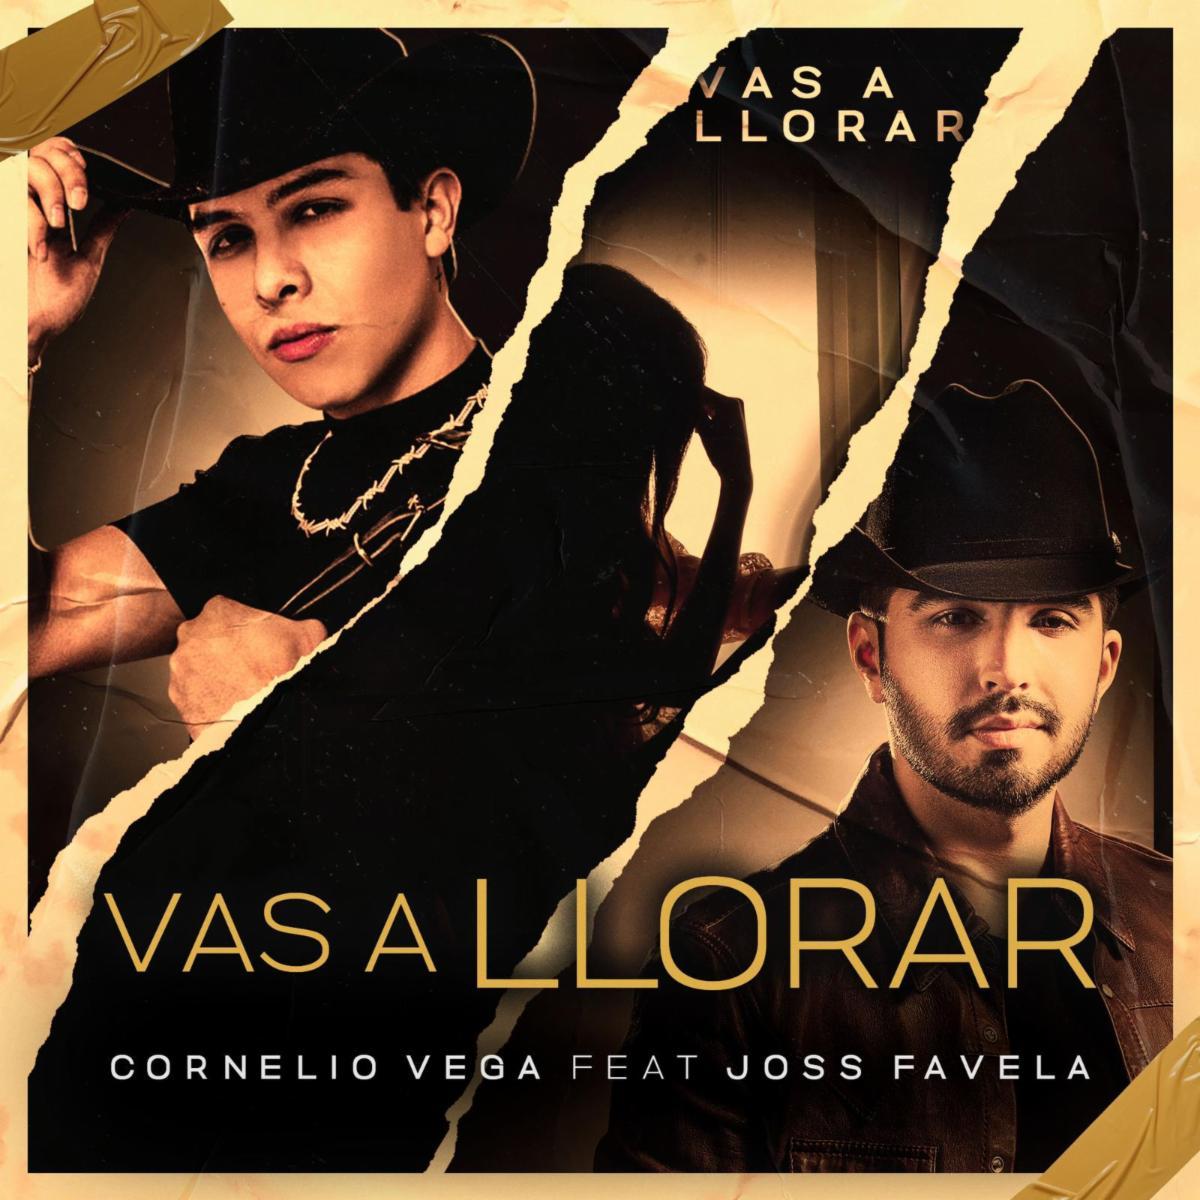 Vas a Llorar Cornelio Vega Ft. Joss Favela Gerencia360